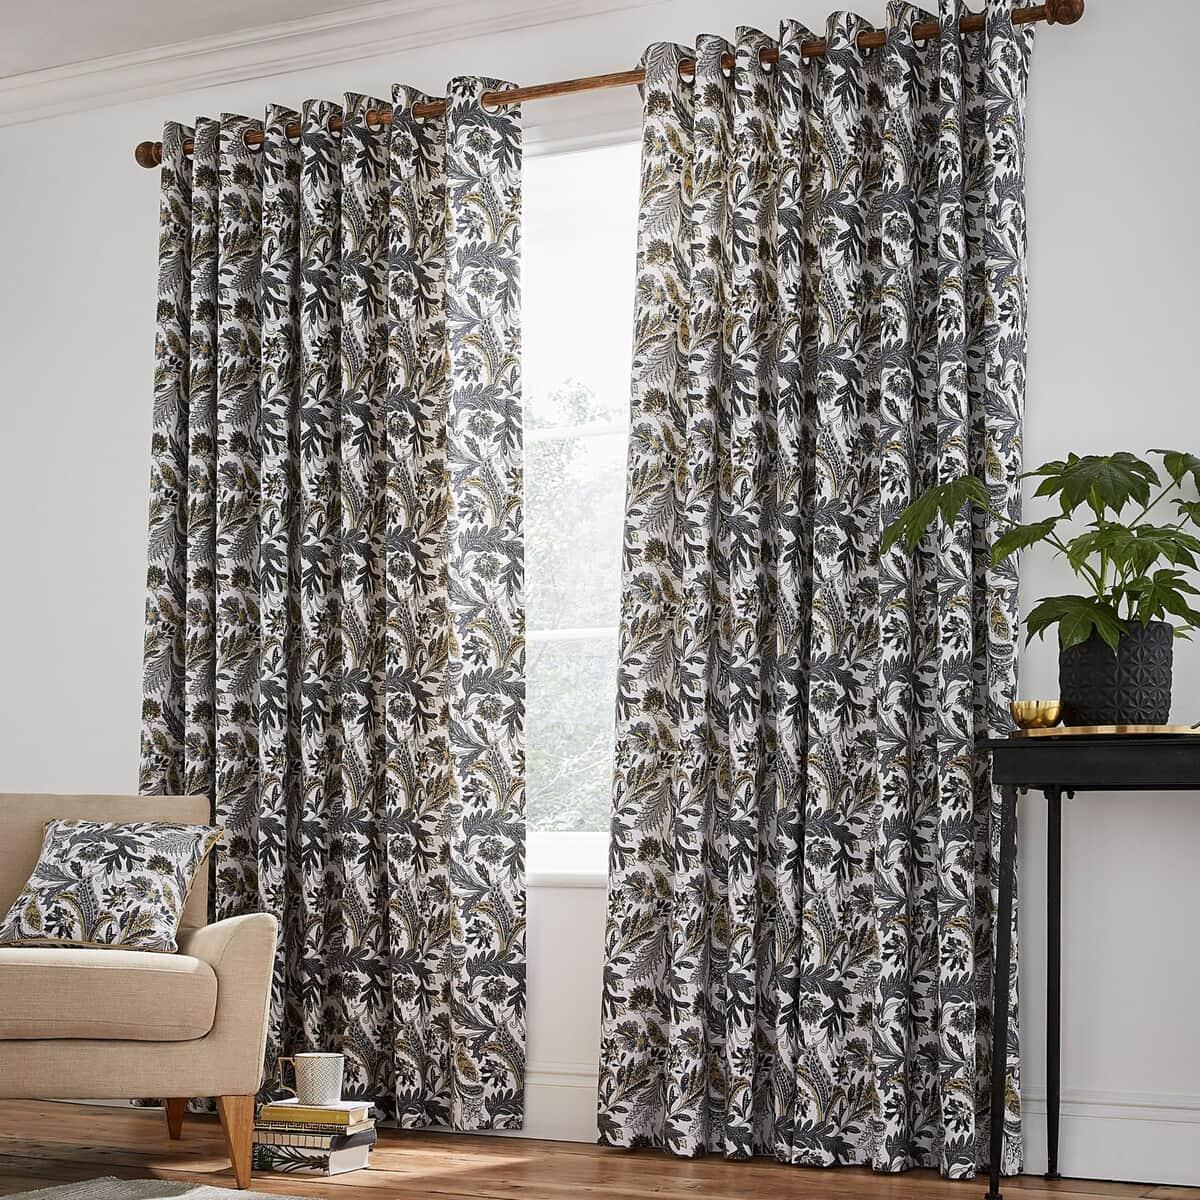 Helena Springfield Jacaranda Charcoal Curtains large